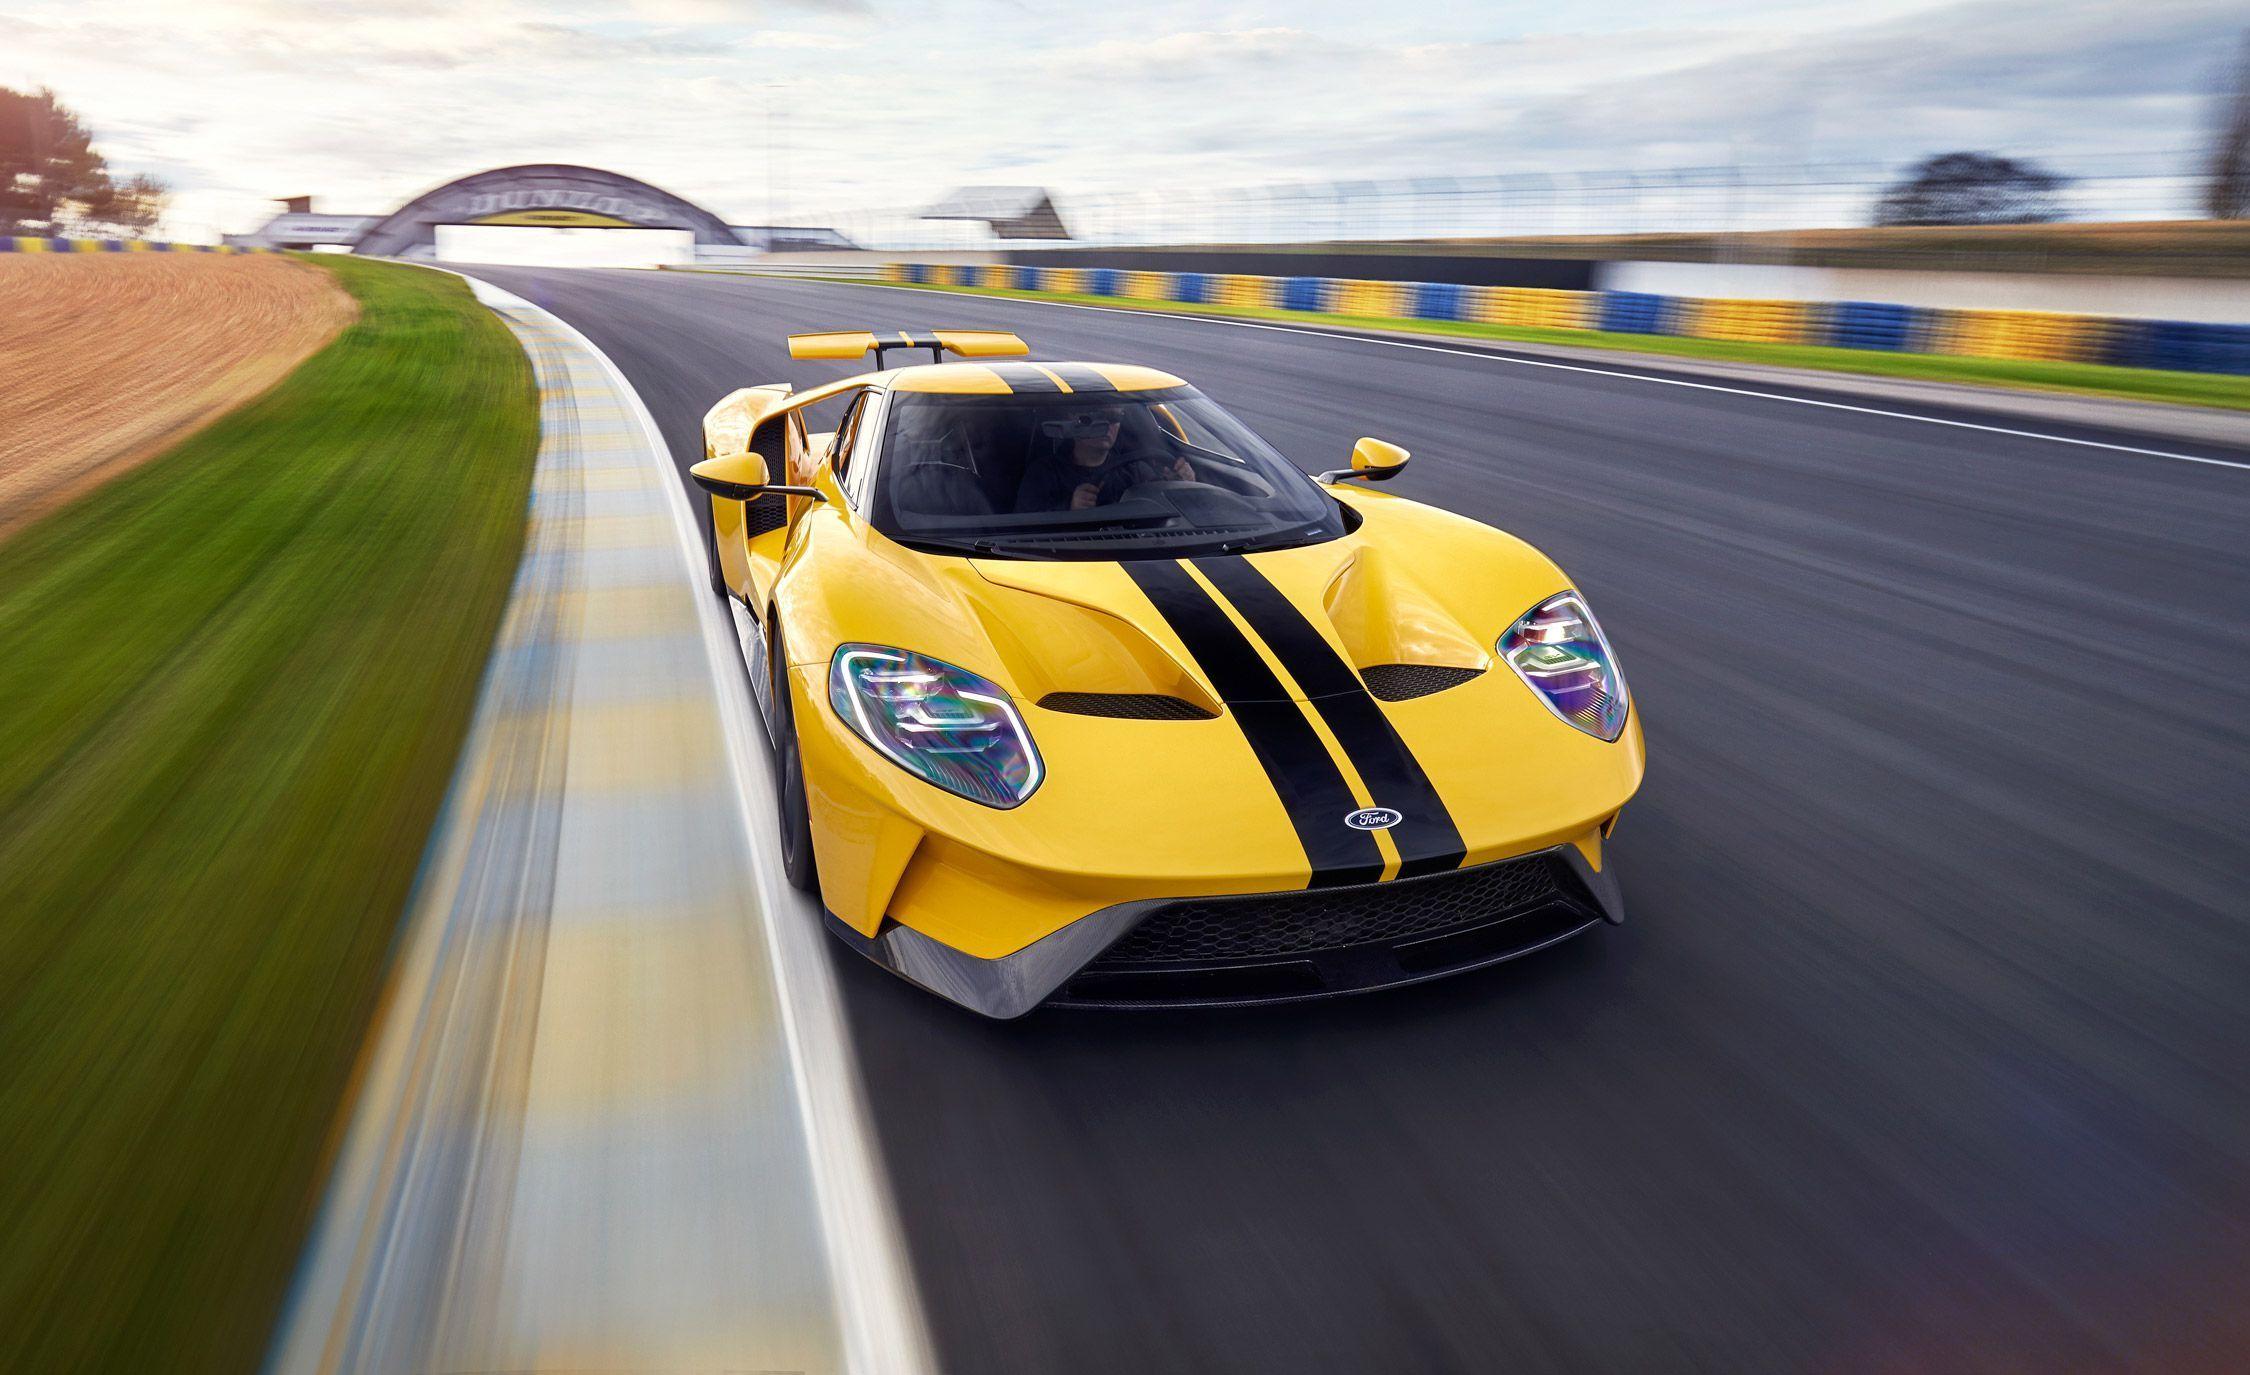 Ford Gt Full Test La Ford In La France Insurancequotes